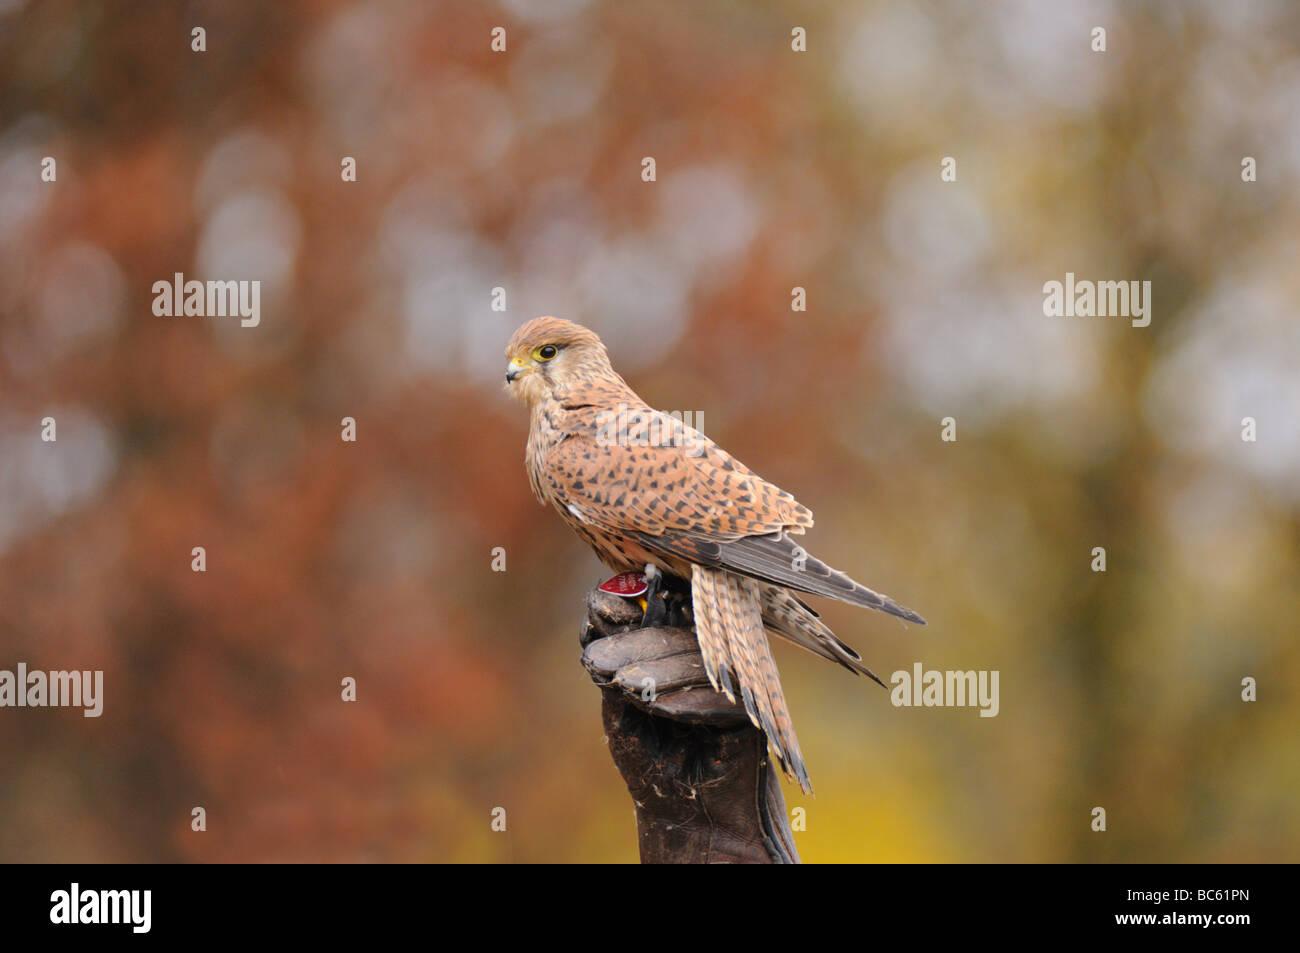 Common Kestrel (Falco tinnunculus) perching on tree stump, Bavaria, Germany - Stock Image